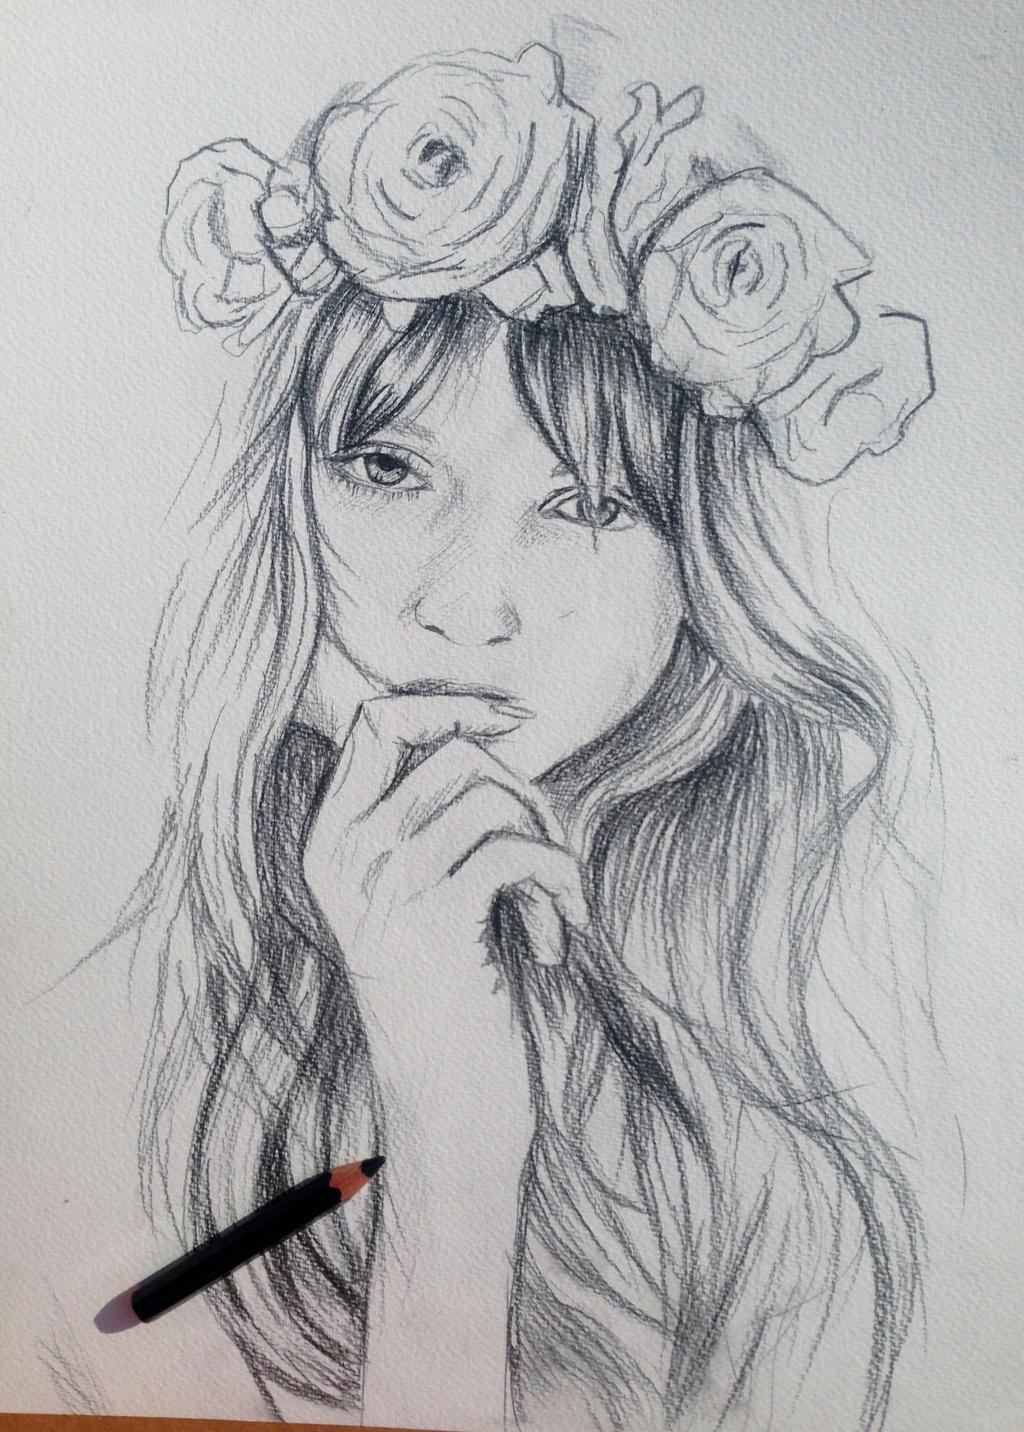 Floral _Crown by justcallmemike on DeviantArt